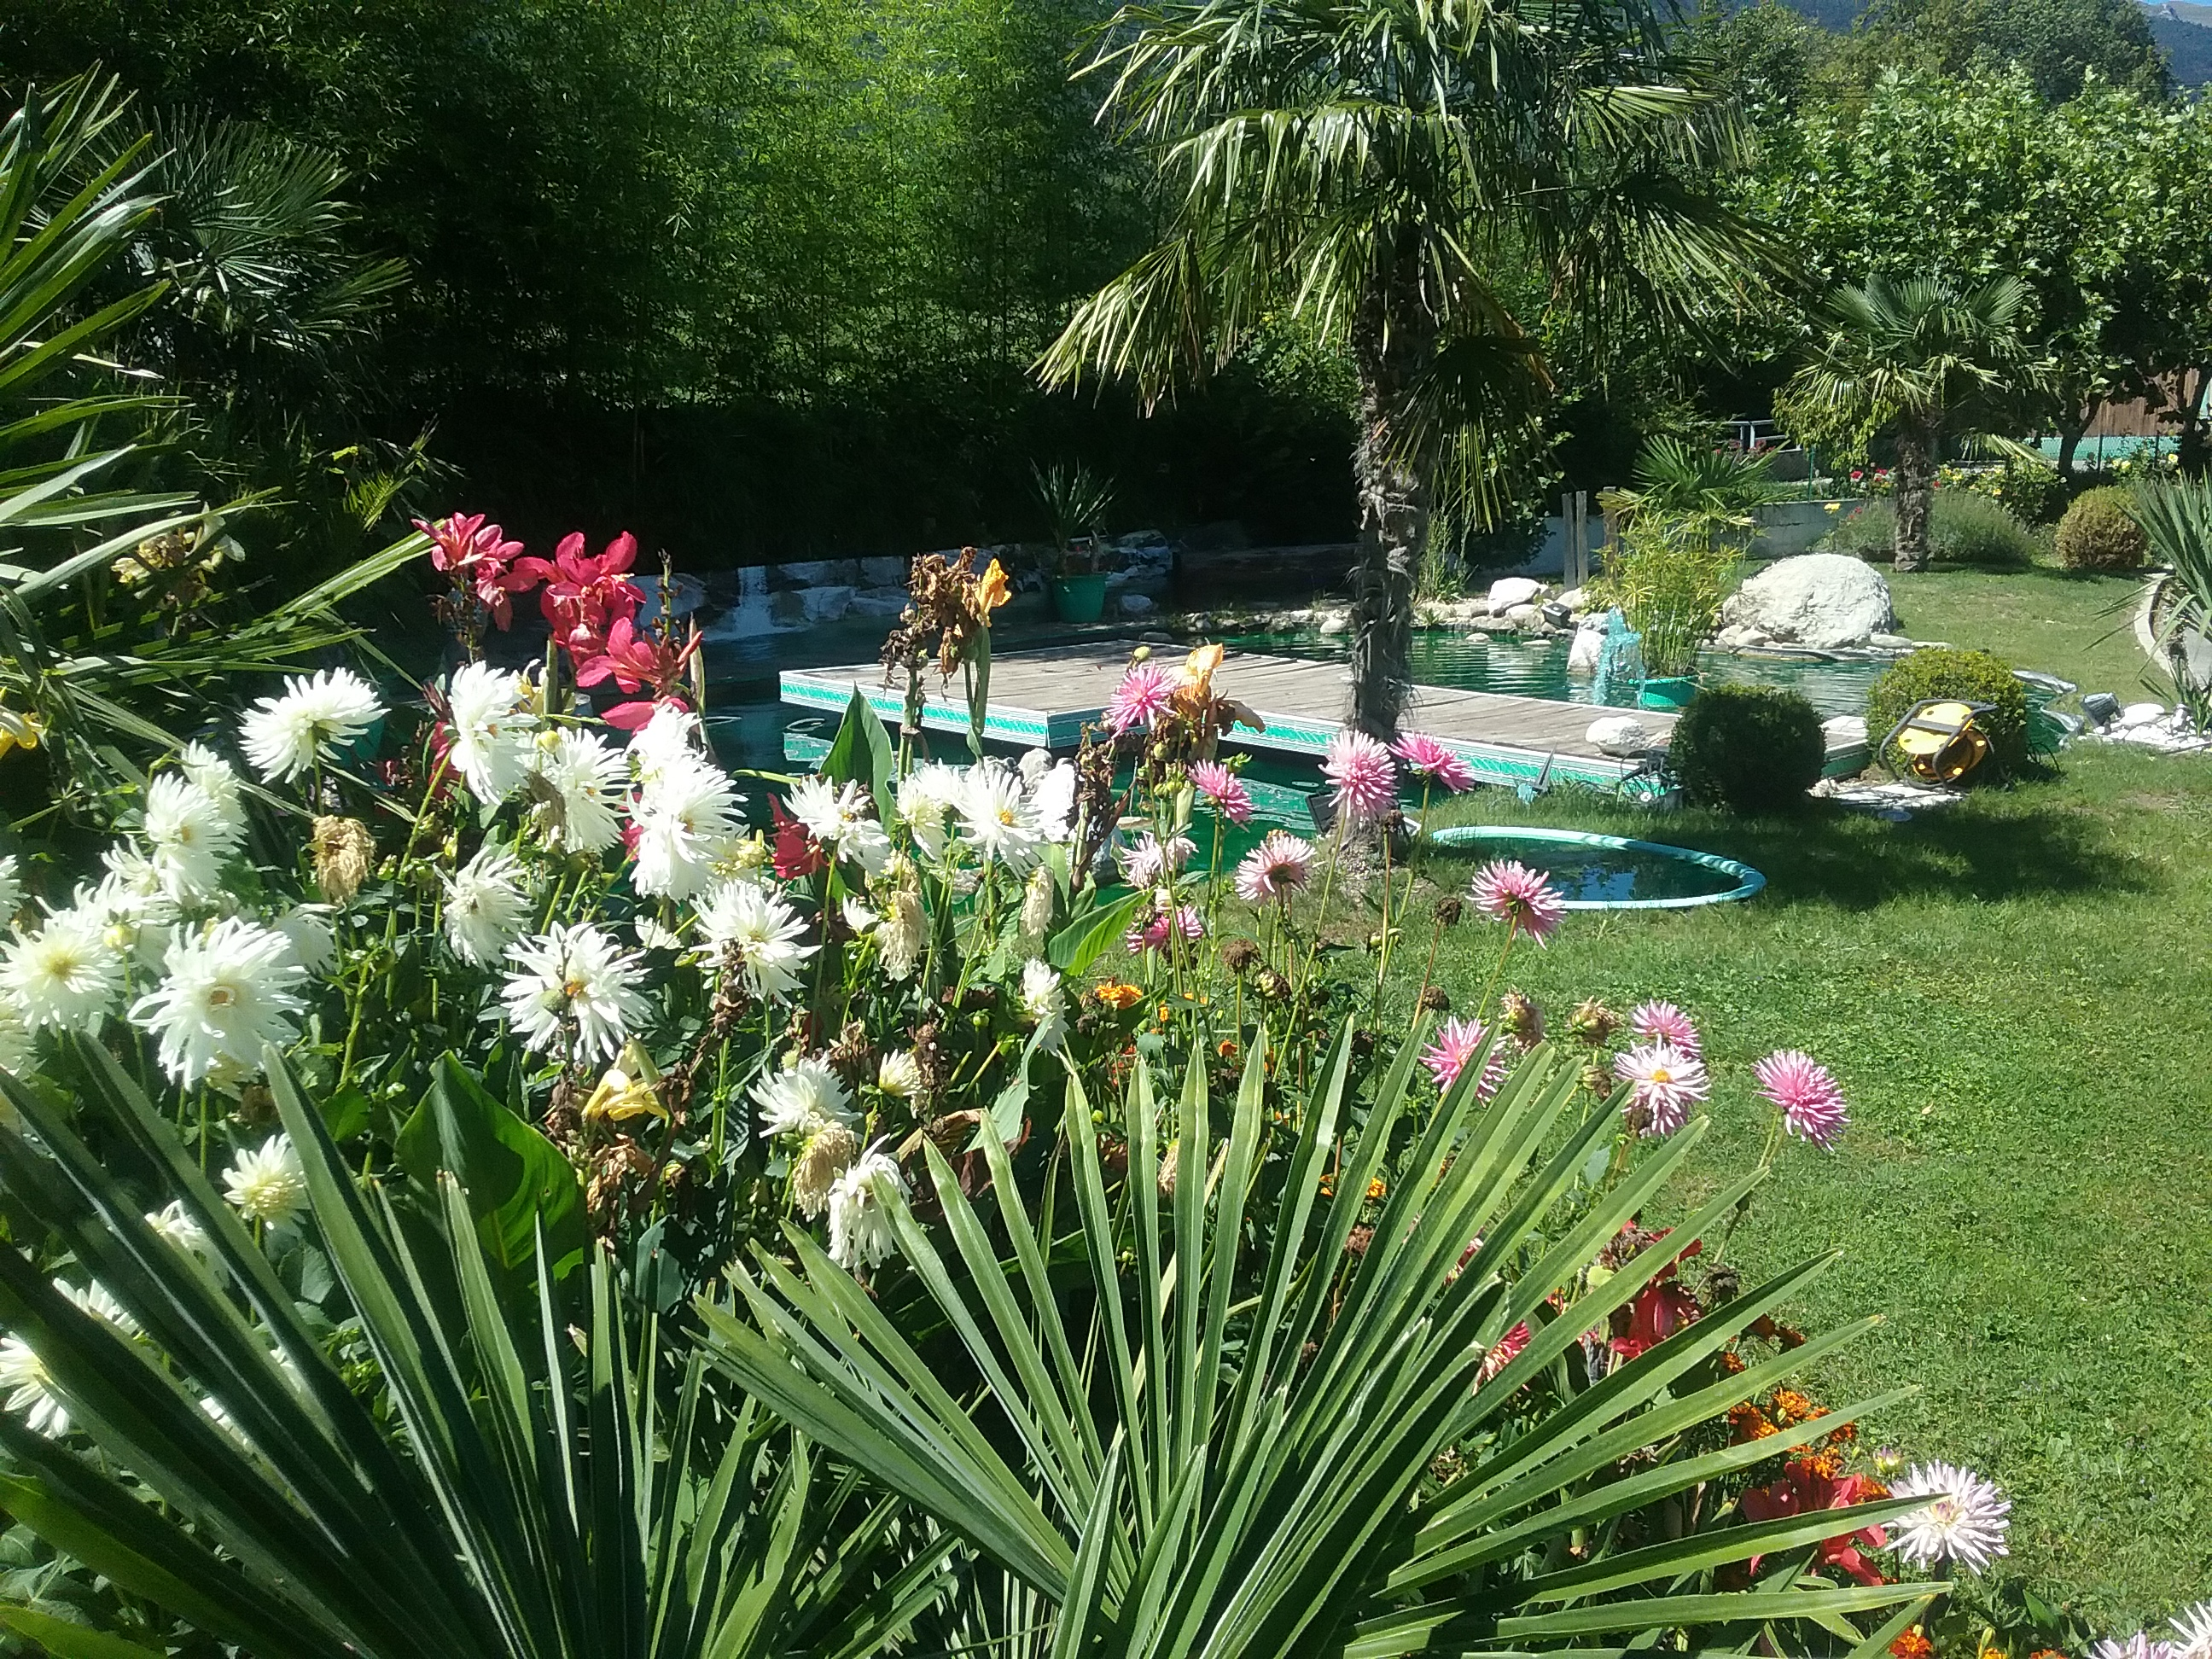 fleurs et bassin, aménagements paysagés